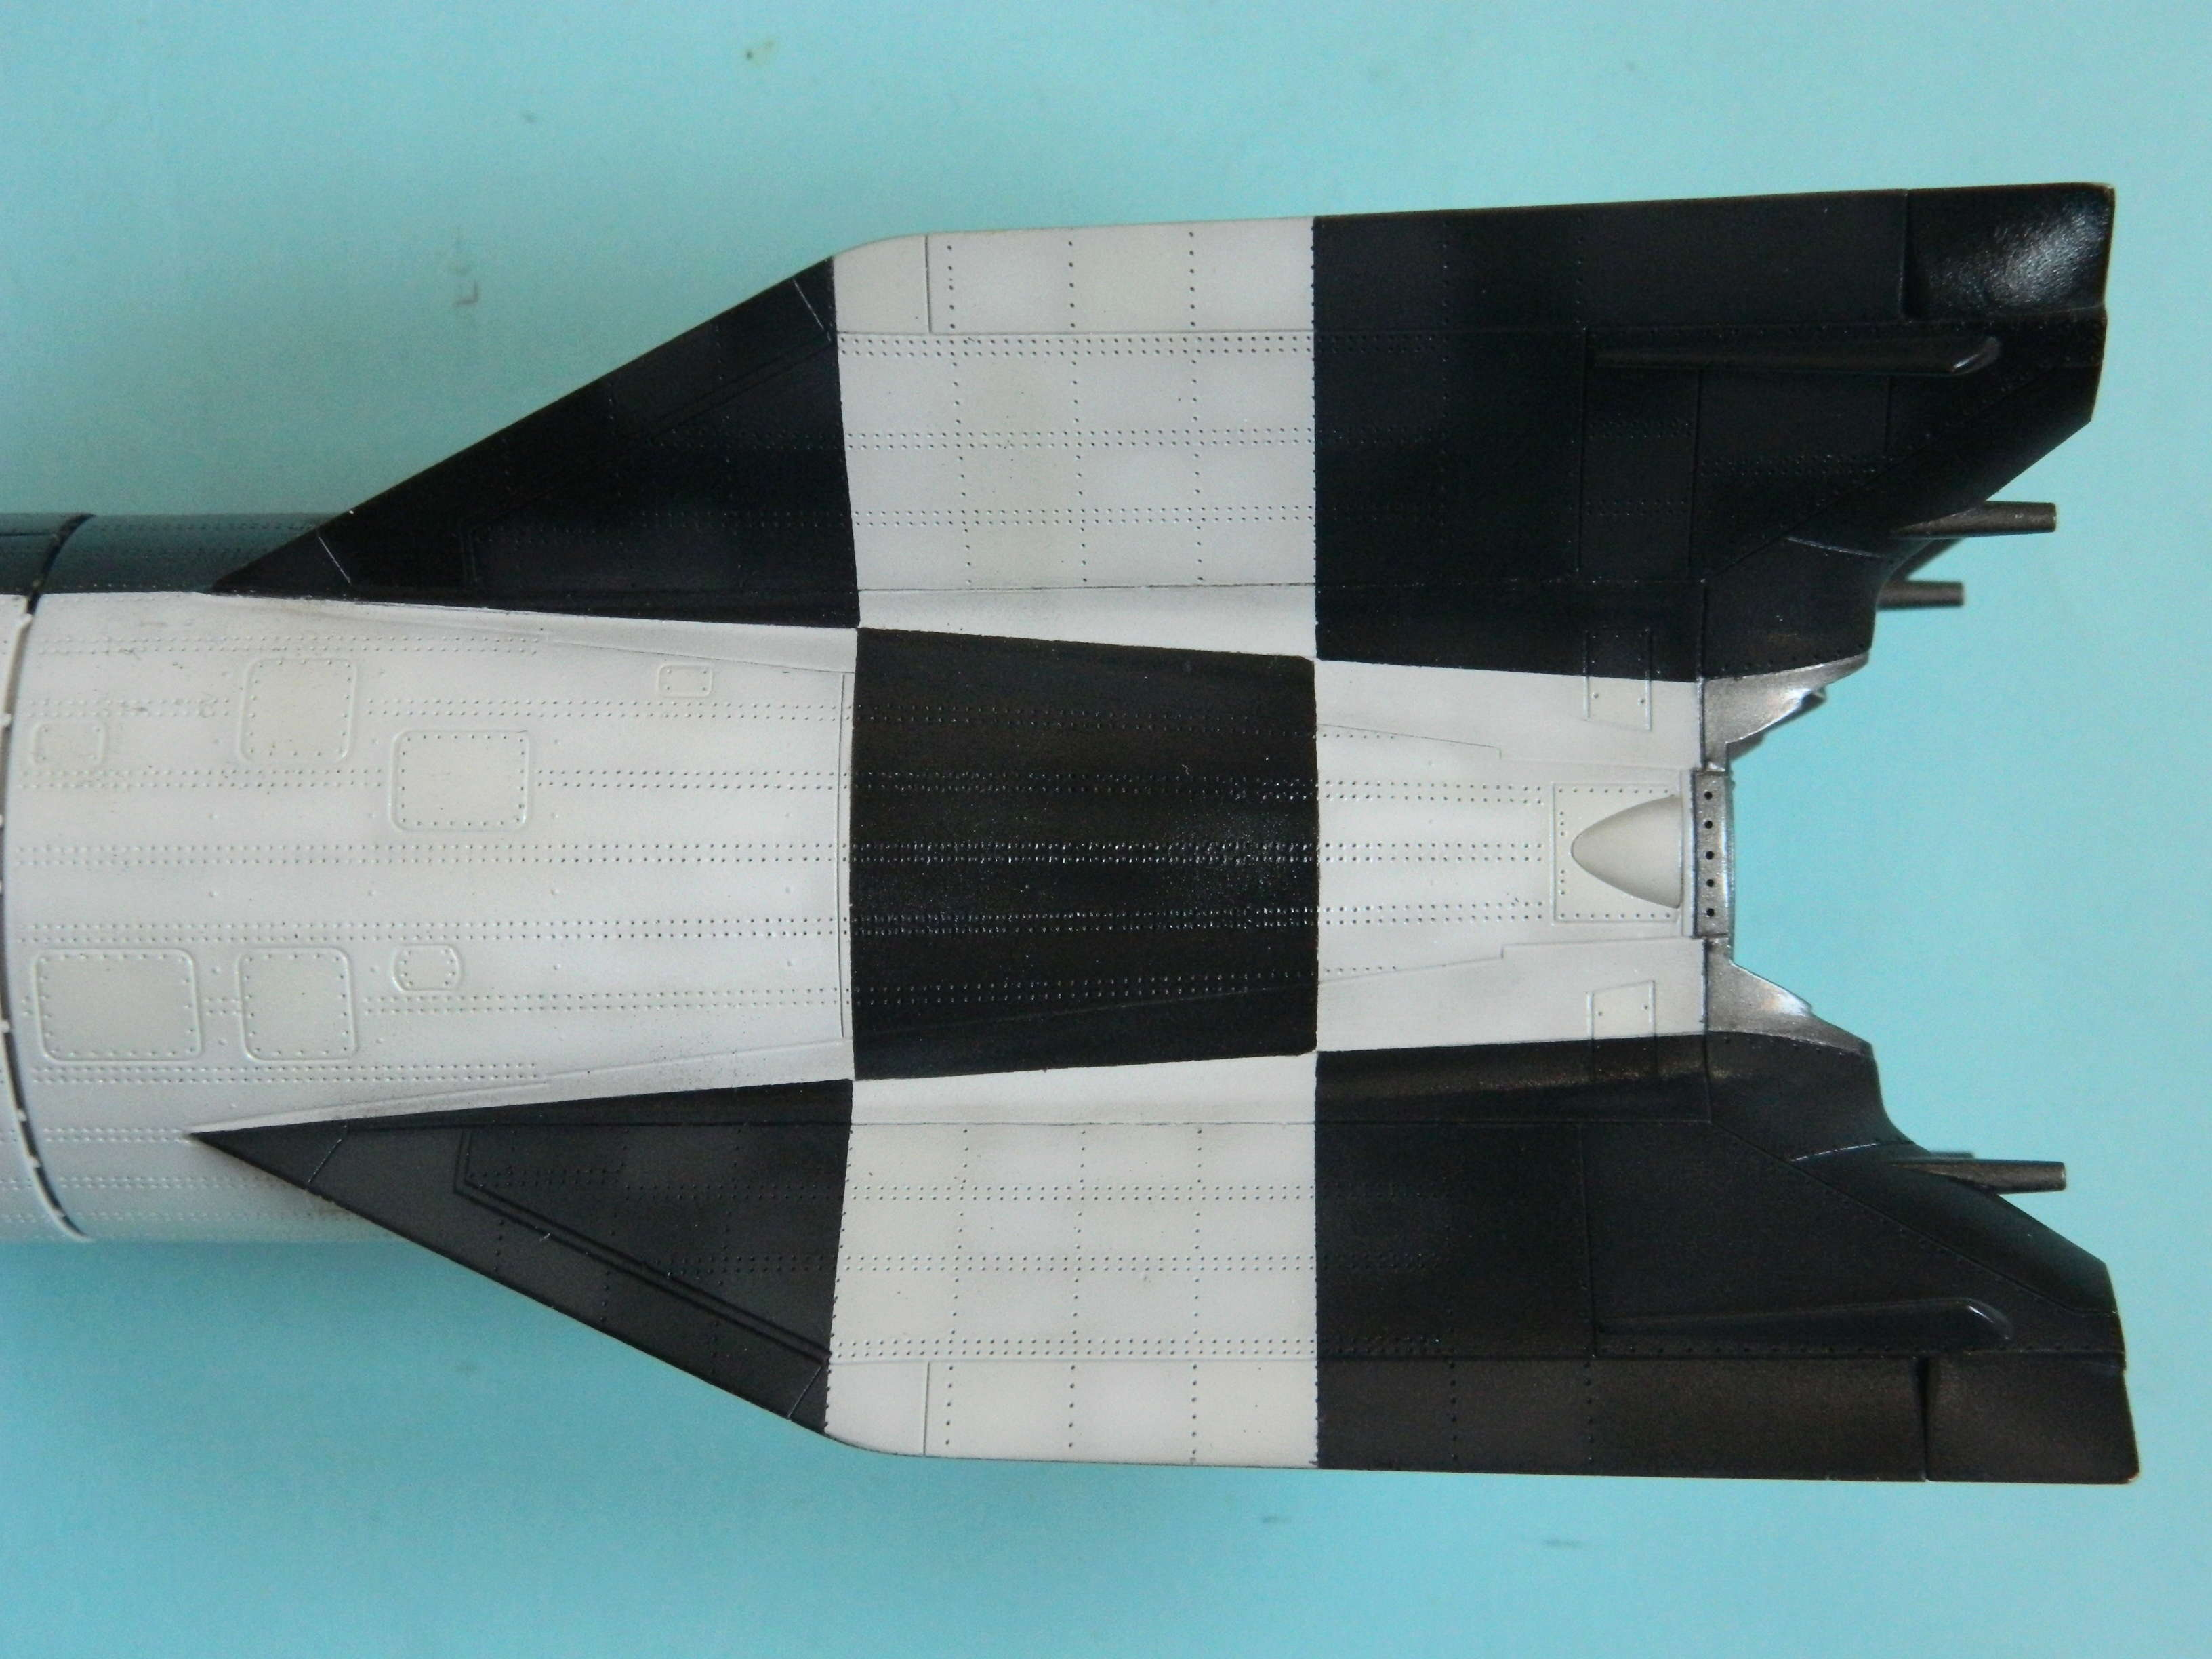 Vergeltungswaffe V-2 . A4. Fini, ou presque. 1812